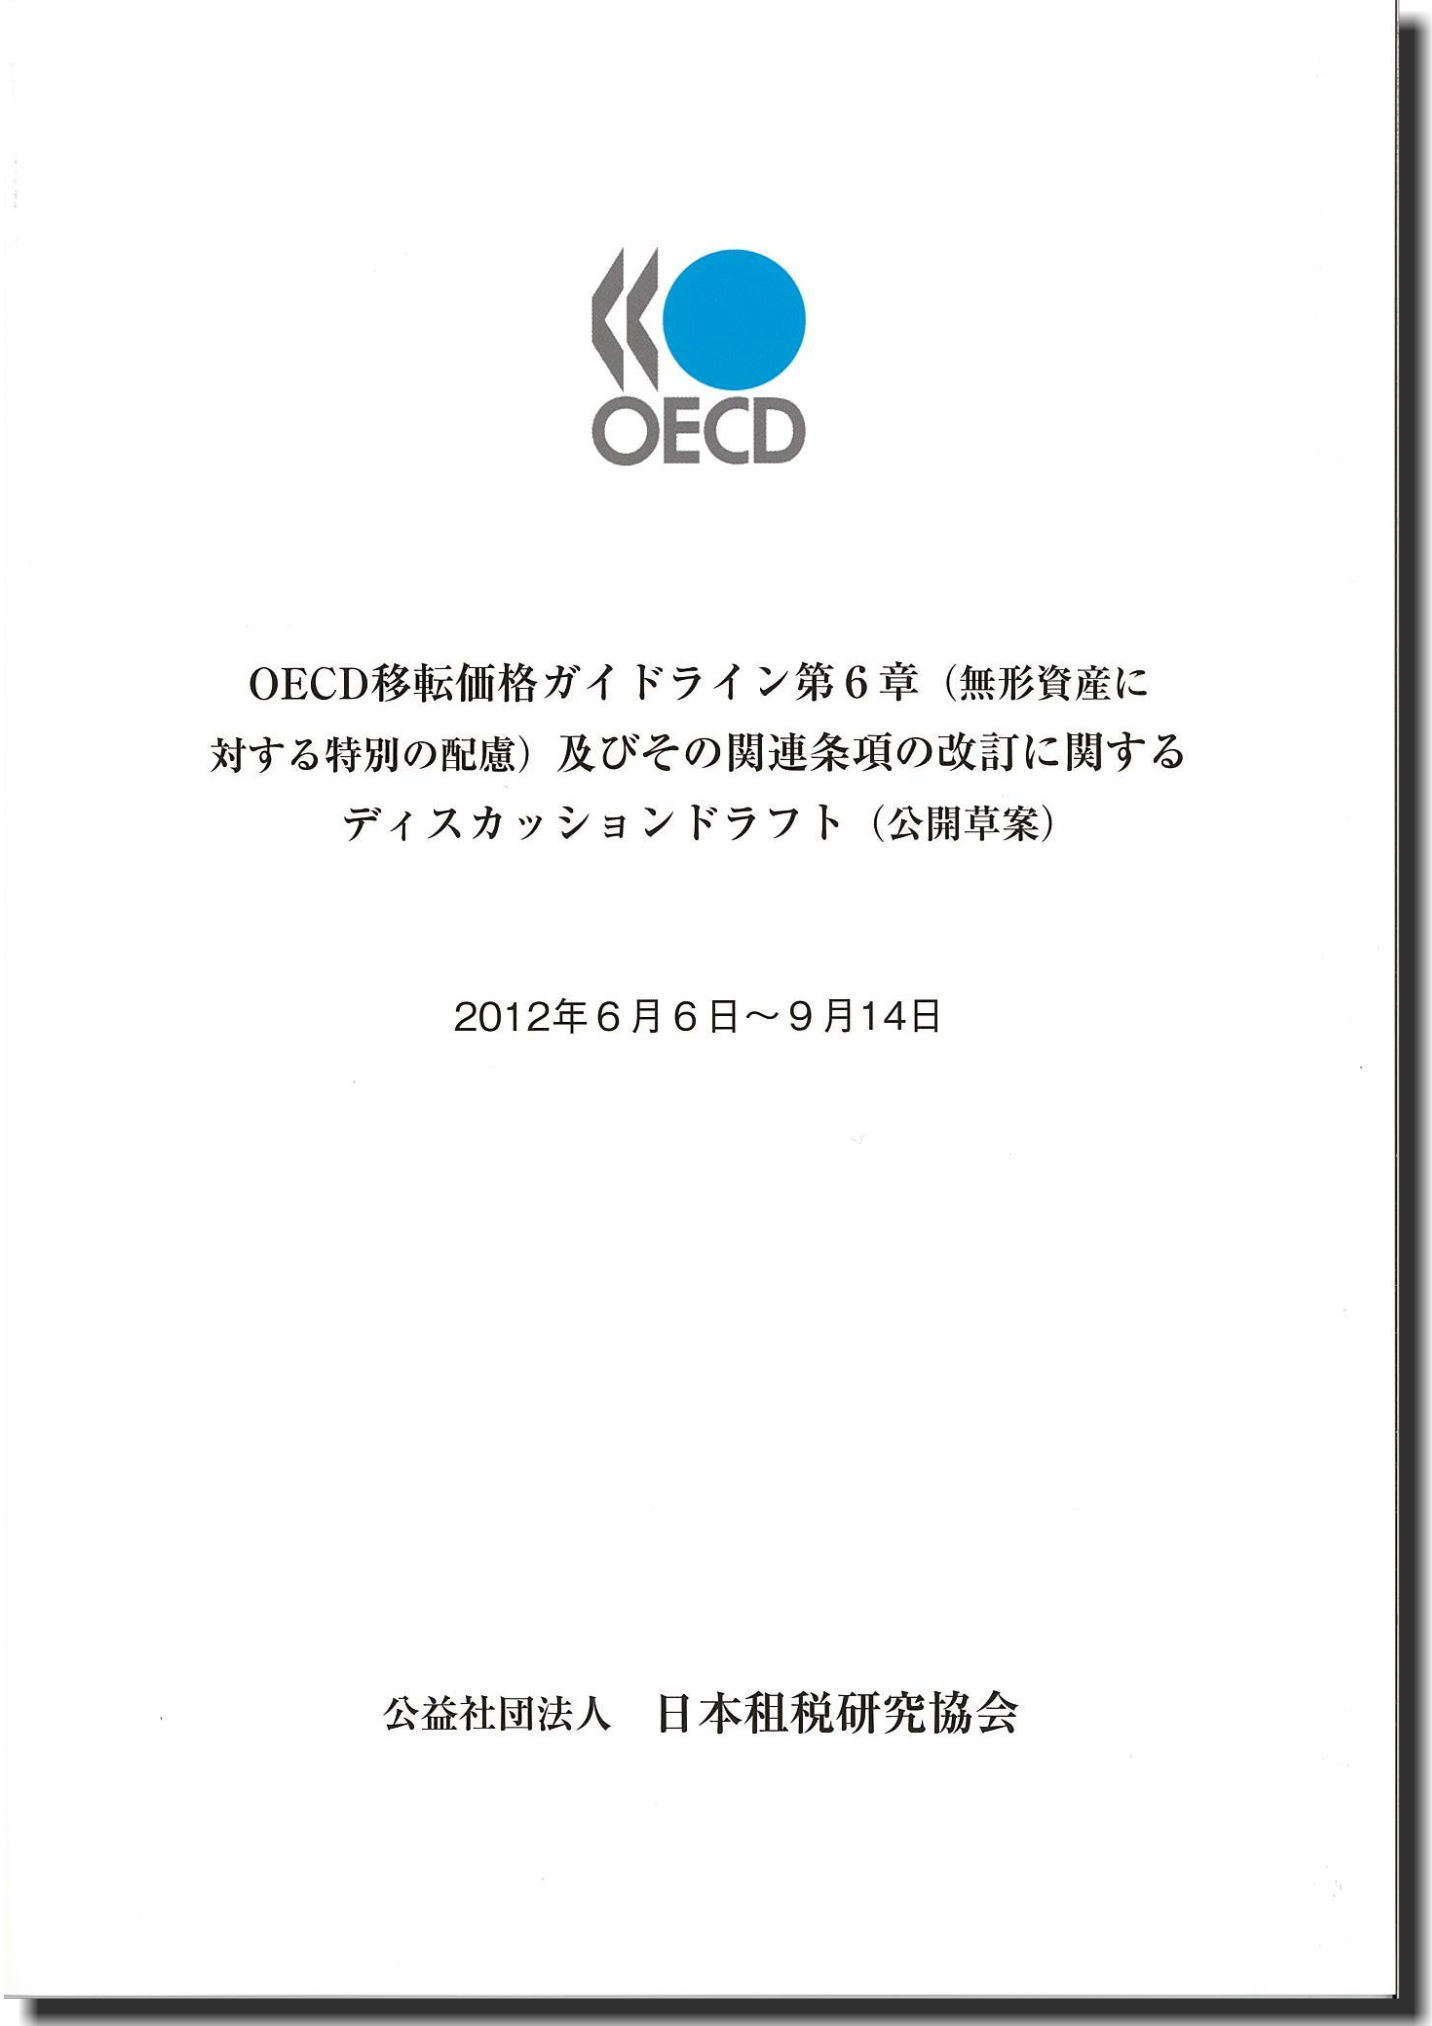 OECD OECD移転価格ガイドライン第6章(無形資産に対する特別の配慮)及びその関連条項の改訂に関するディスカッションドラフト(公開草案)